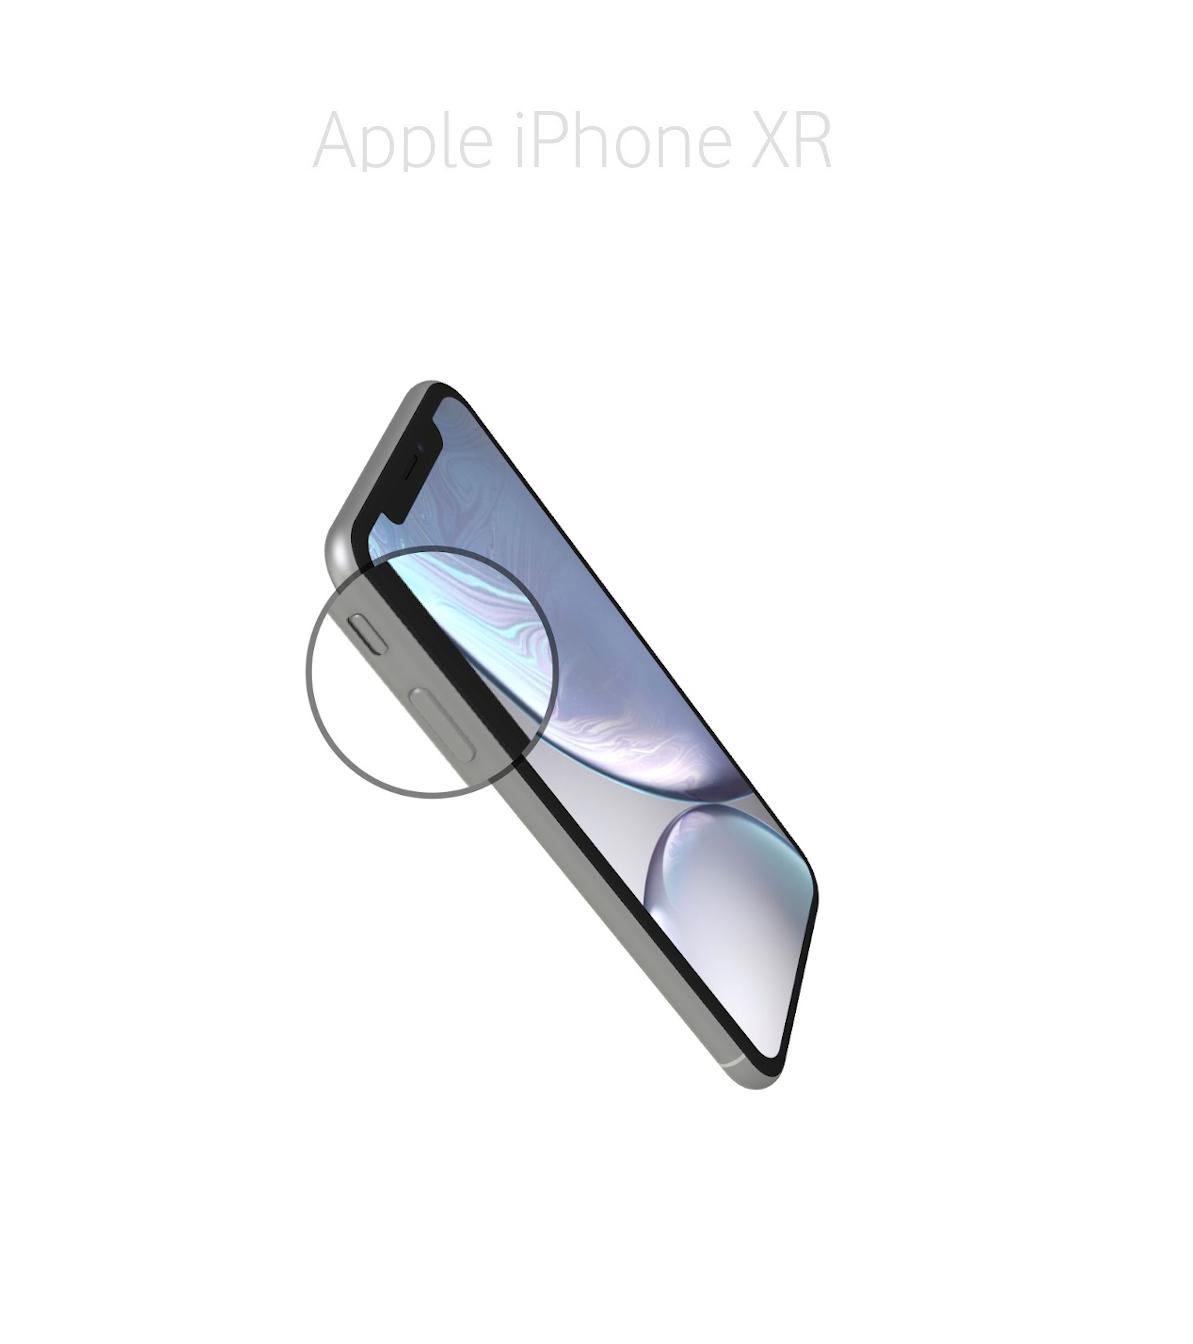 Laga volym/muteknapp iPhone XR